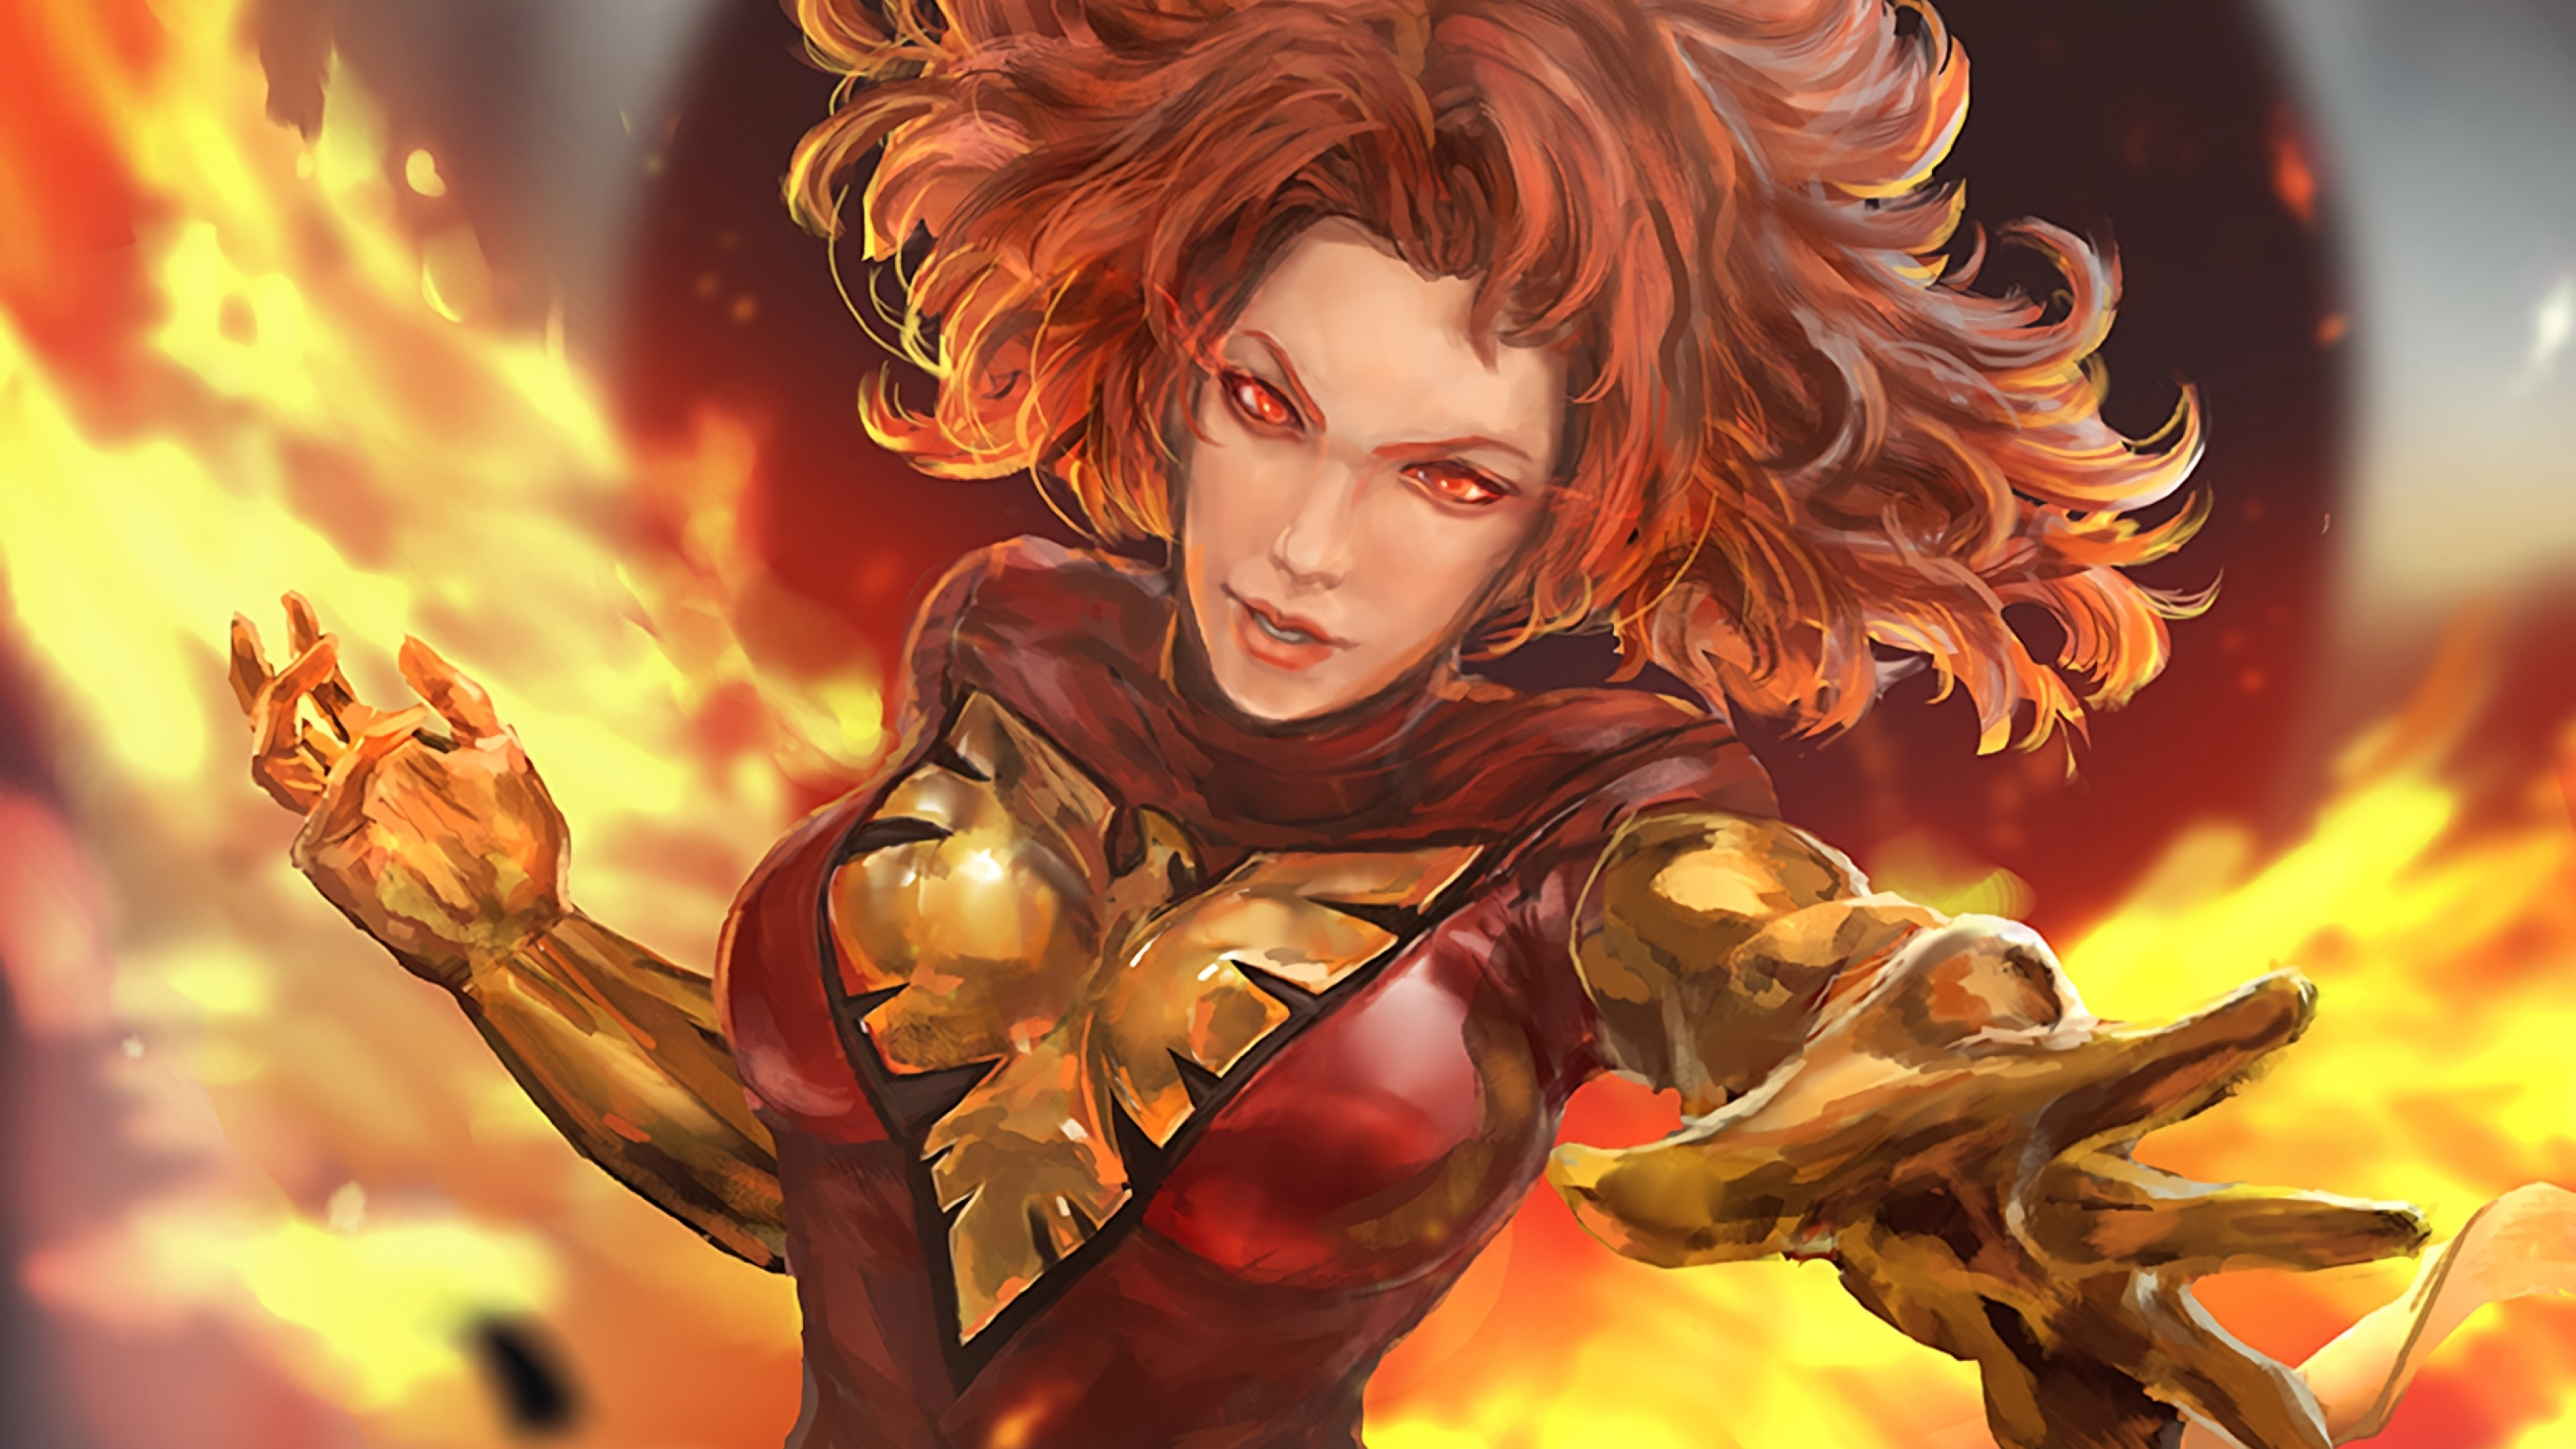 Res: 3840x2160, X-men, Jean Grey, Dark Phoenix, Marvel Girl, Red Eyes,